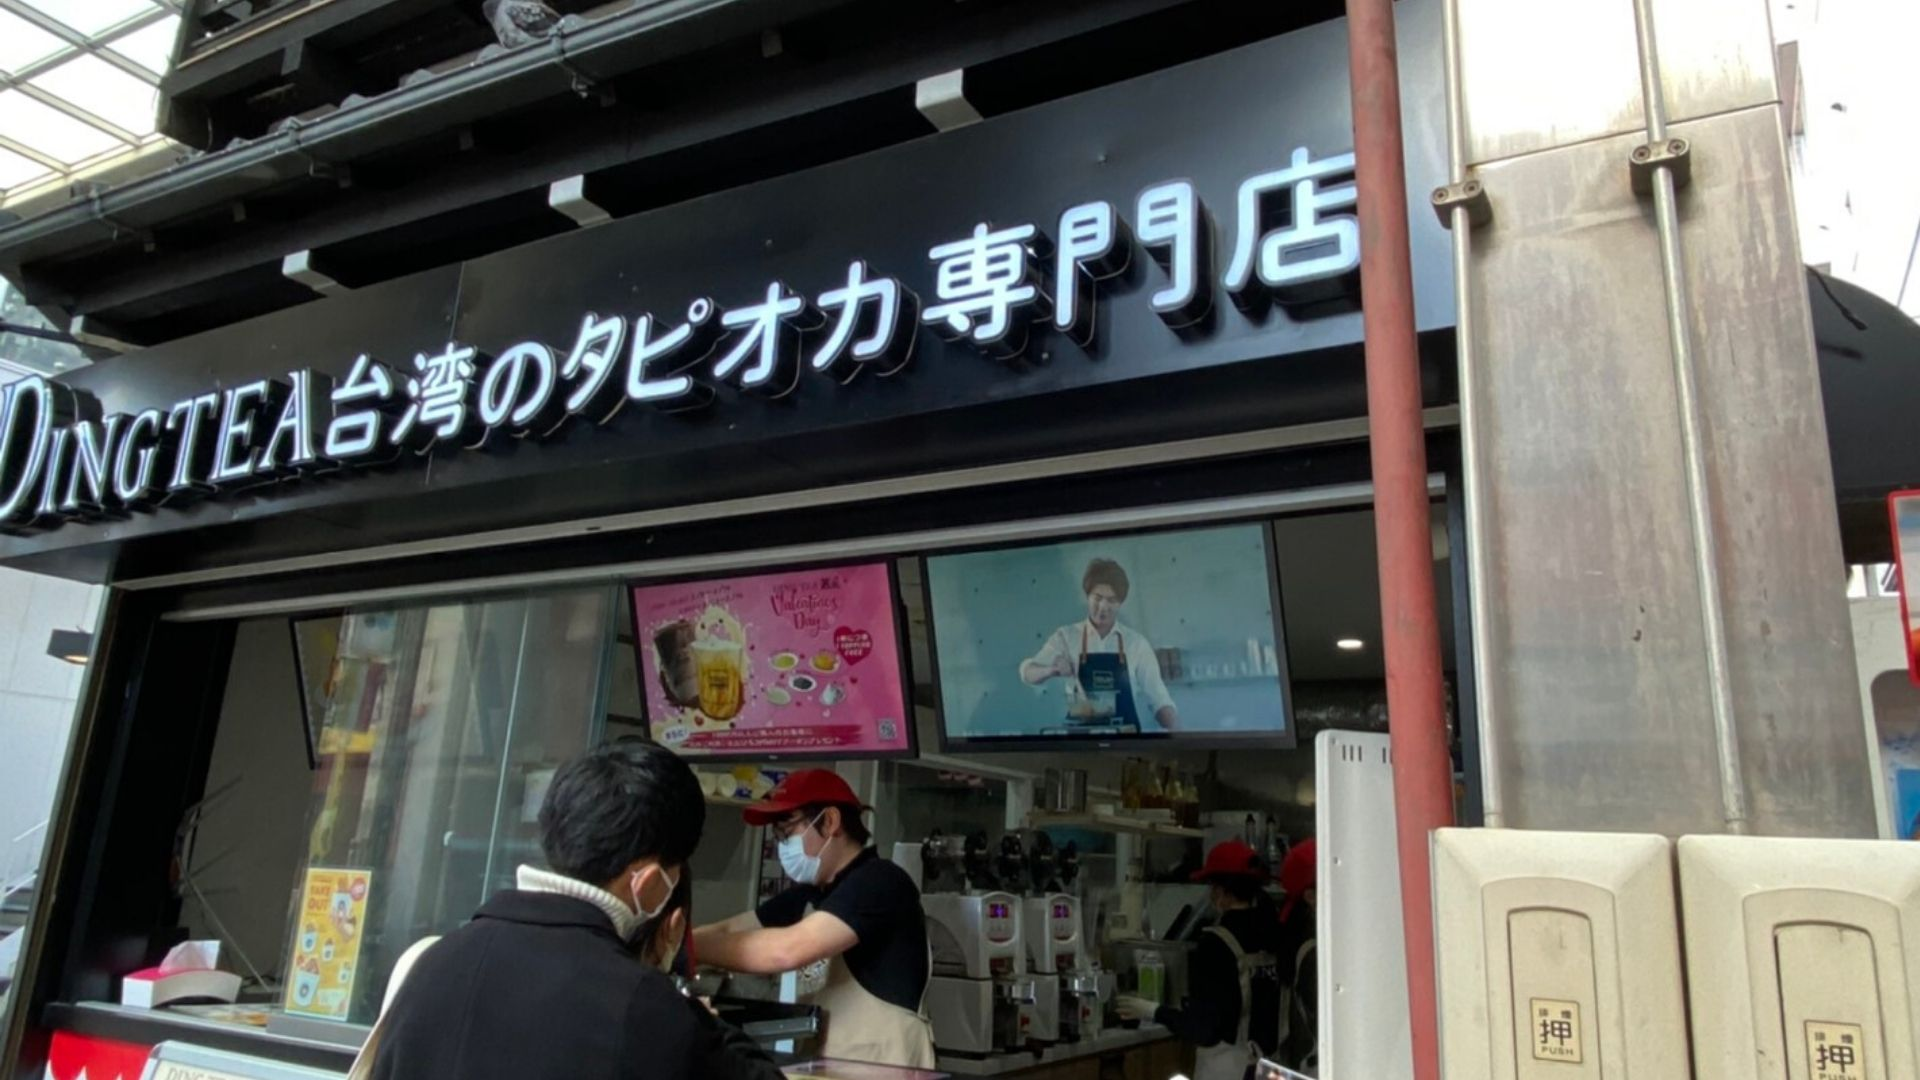 DING TEA台湾タピオカ専門店